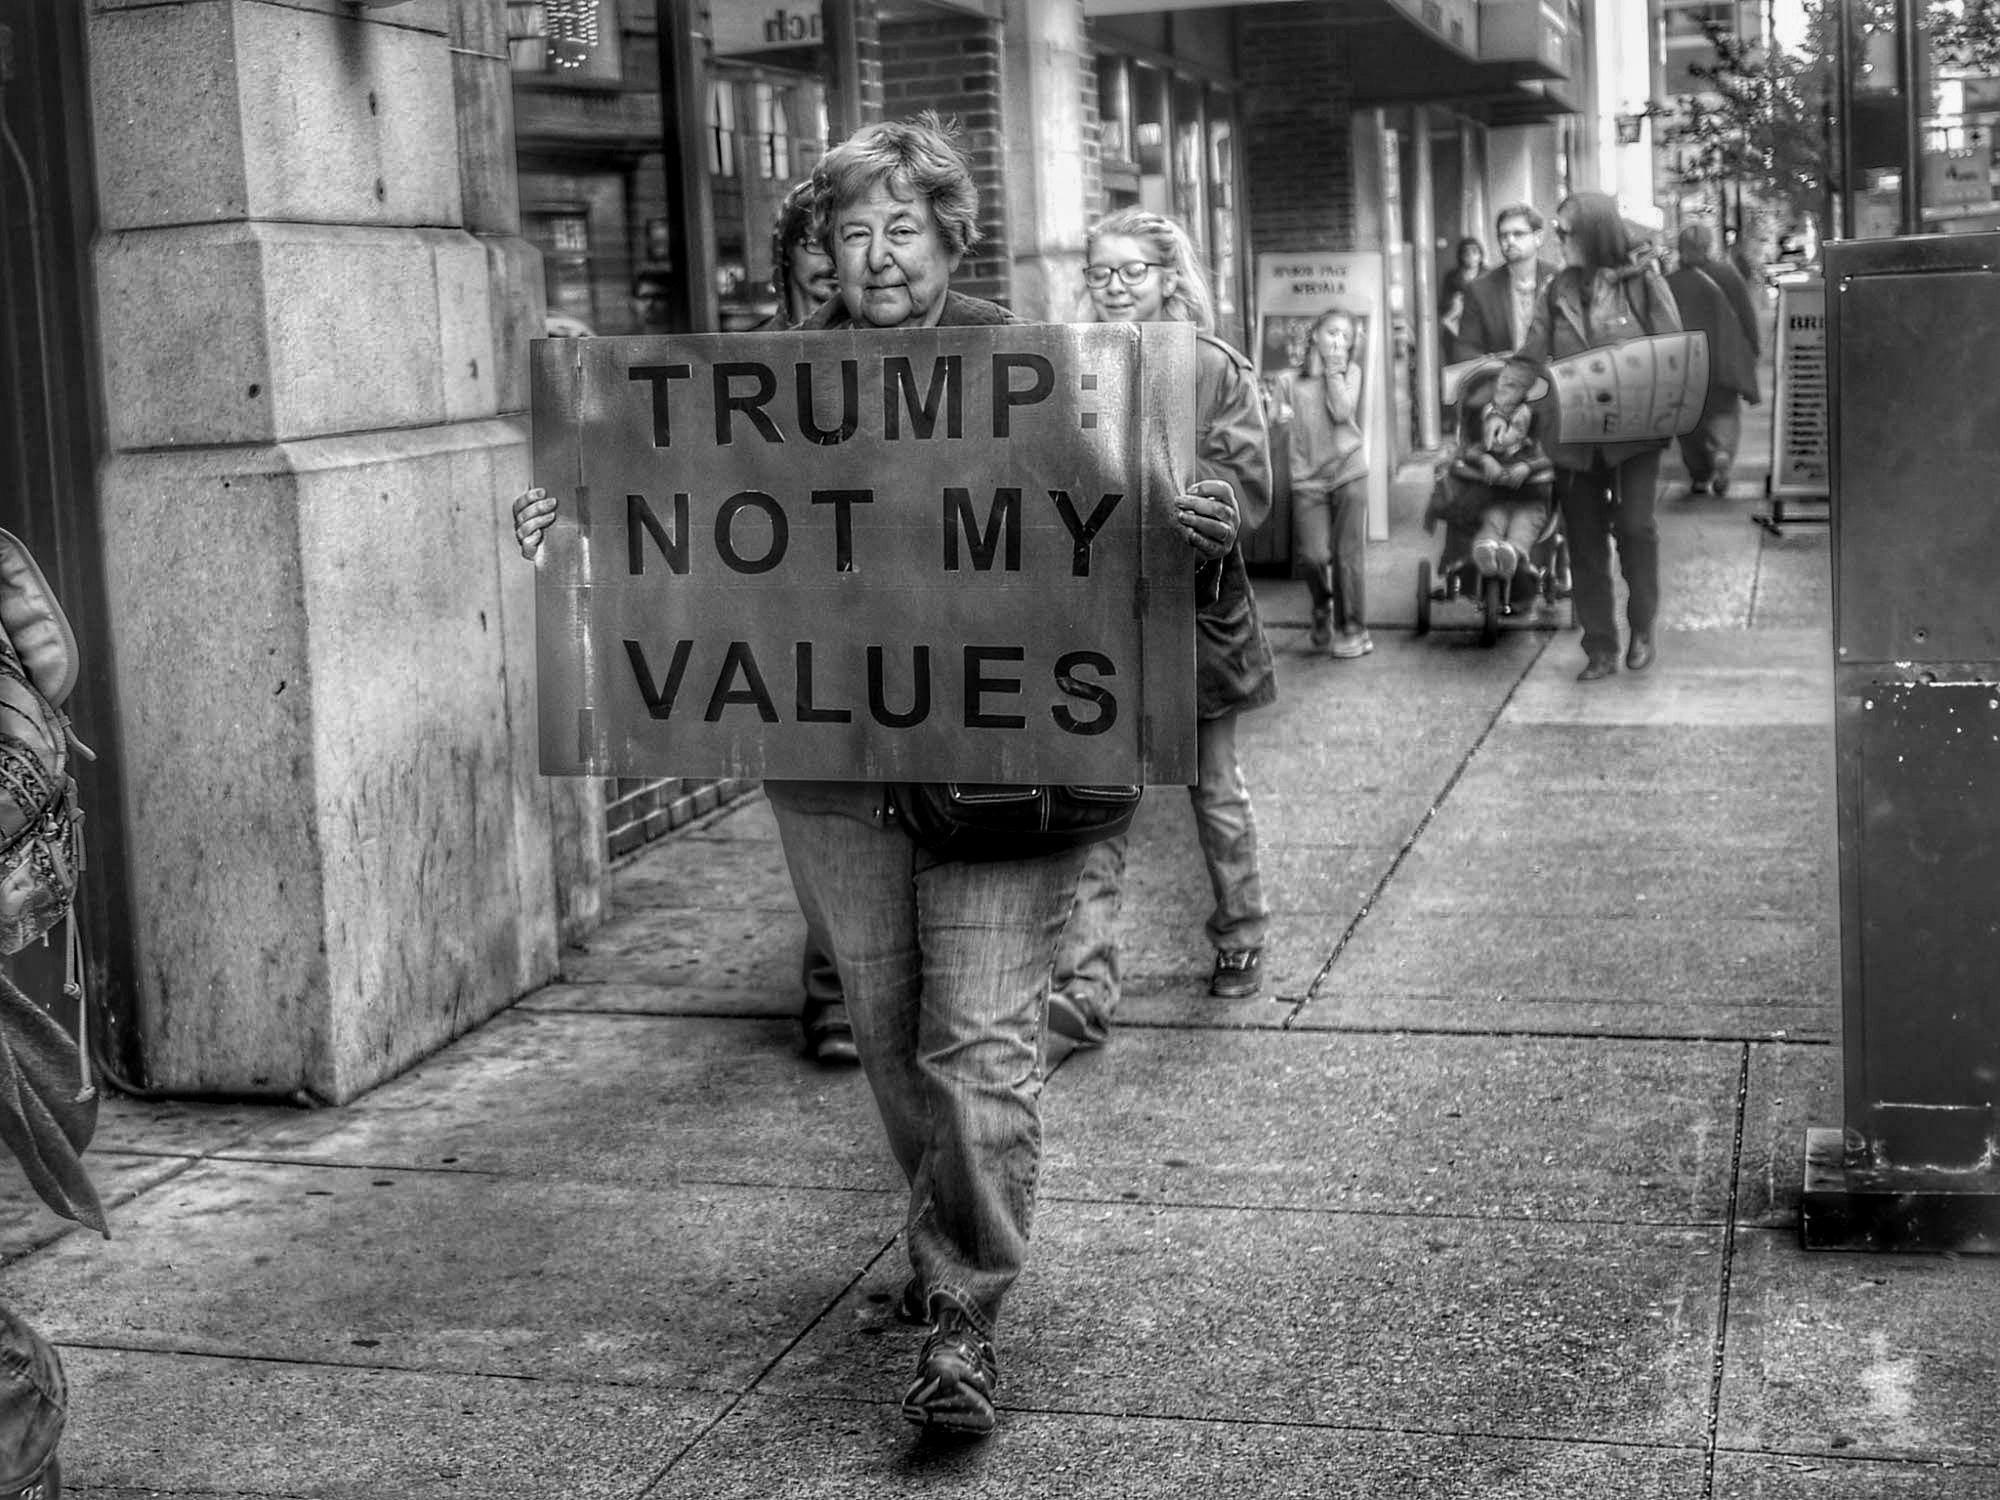 Anti-trump and BLM